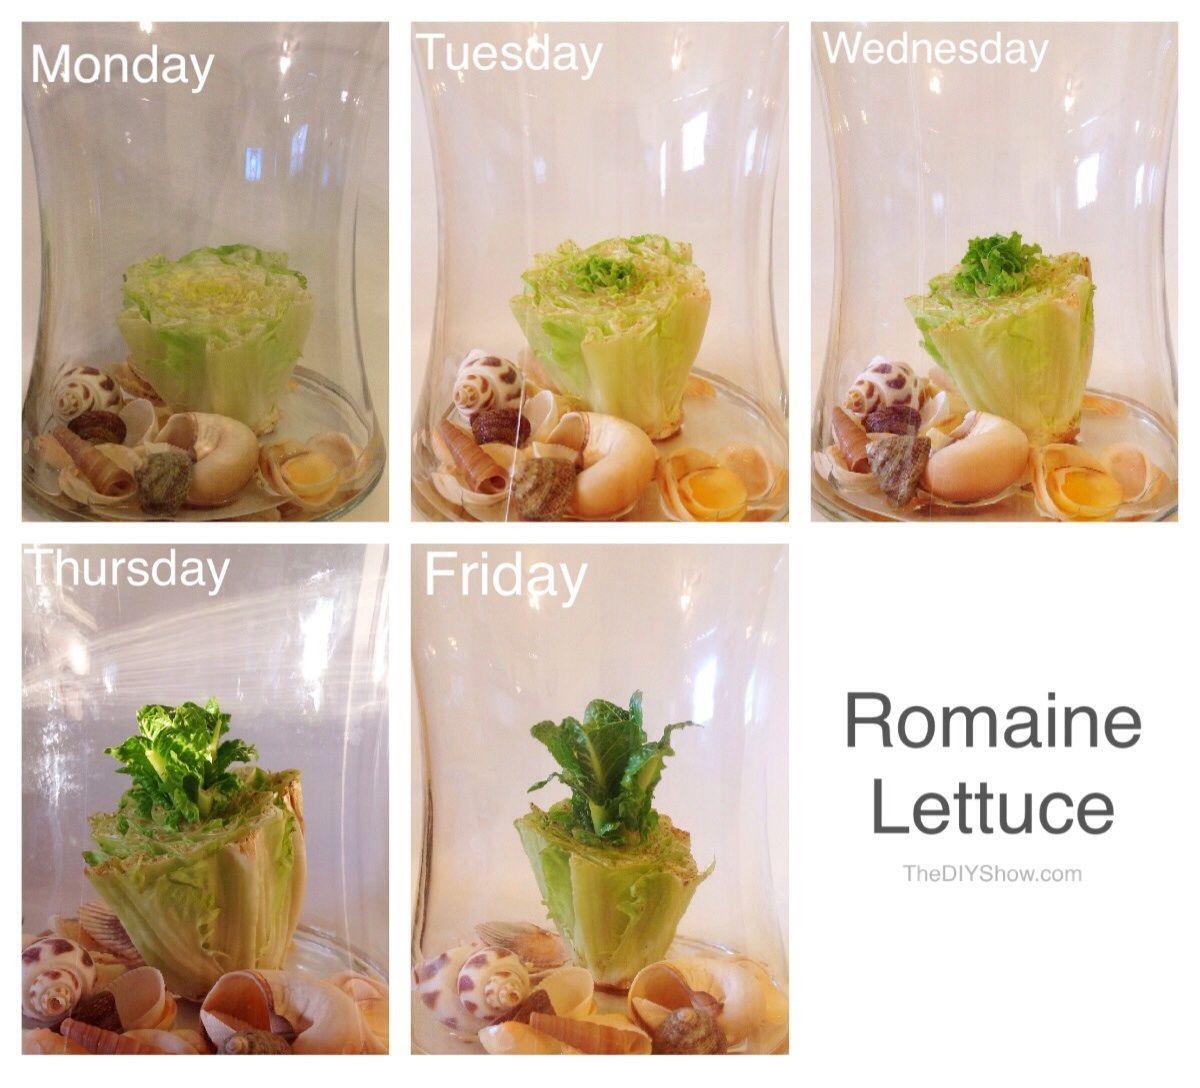 Best 25 Regrow Romaine Lettuce Ideas On Pinterest: Regrow Romaine Lettuce In Water.